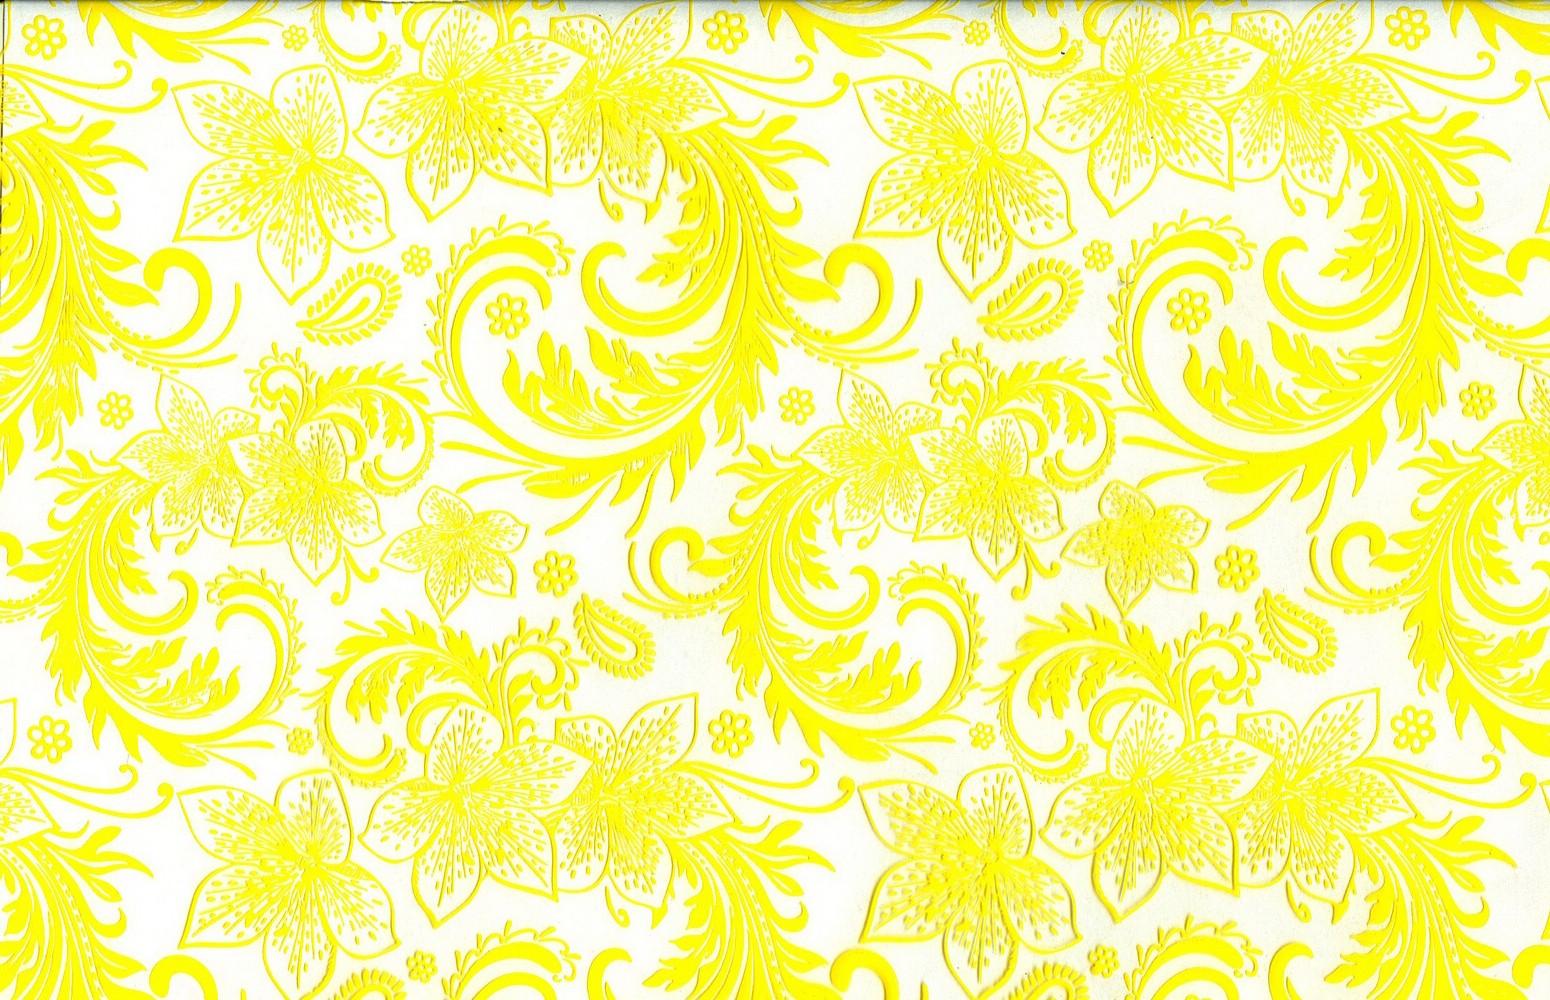 узор желтый картинка самолета гордятся тем